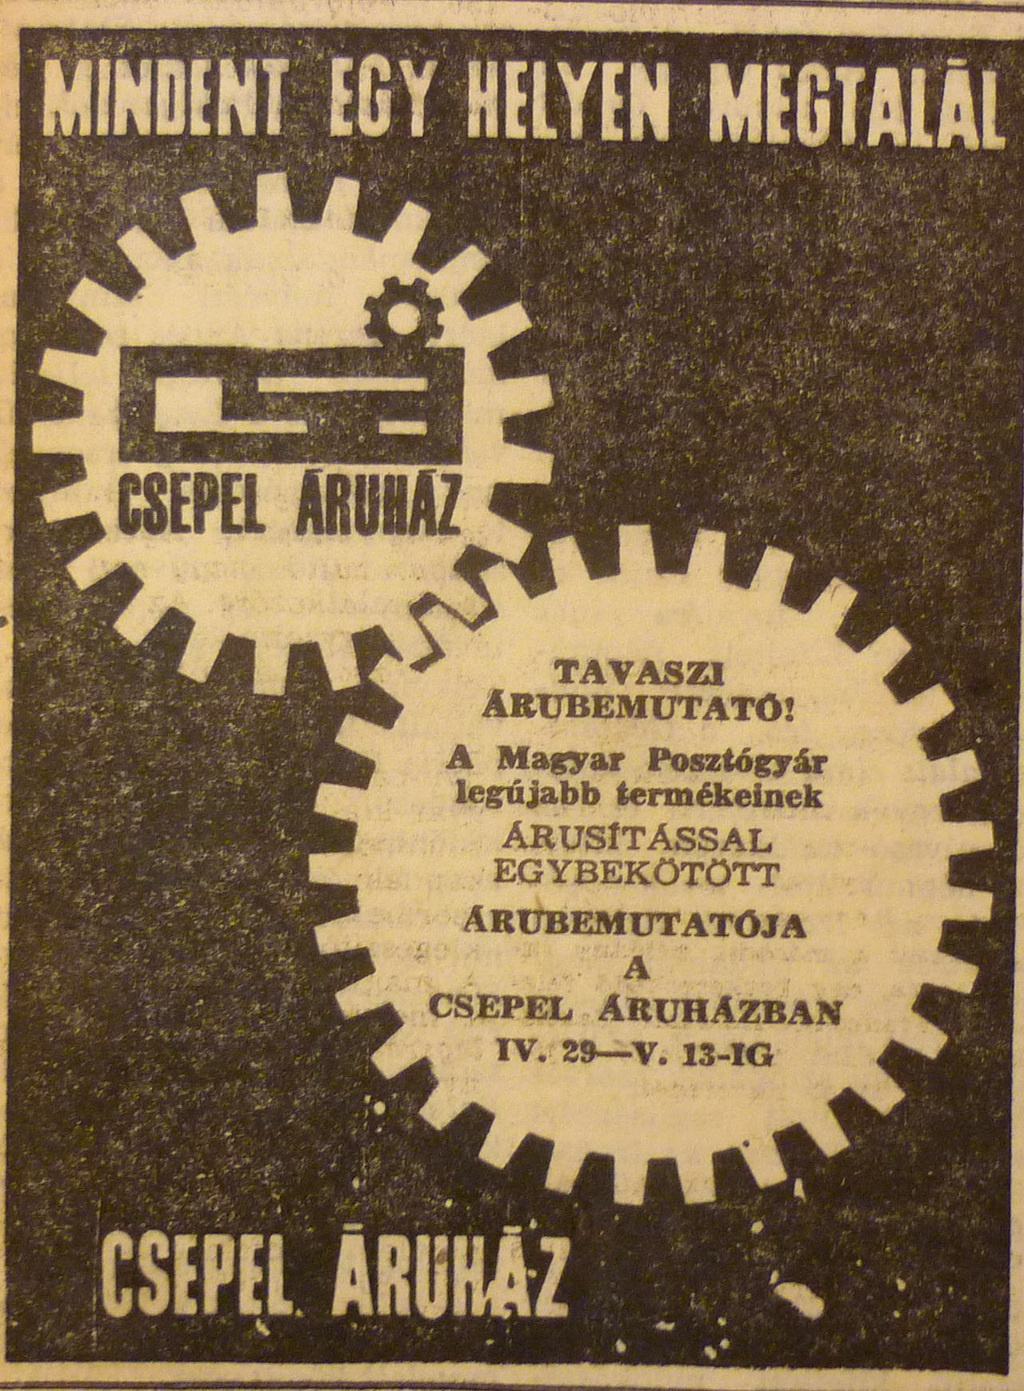 fovarosi.blog.hu: CsepelAruhaz-196704-MagyarNemzetHirdetes - indafoto.hu